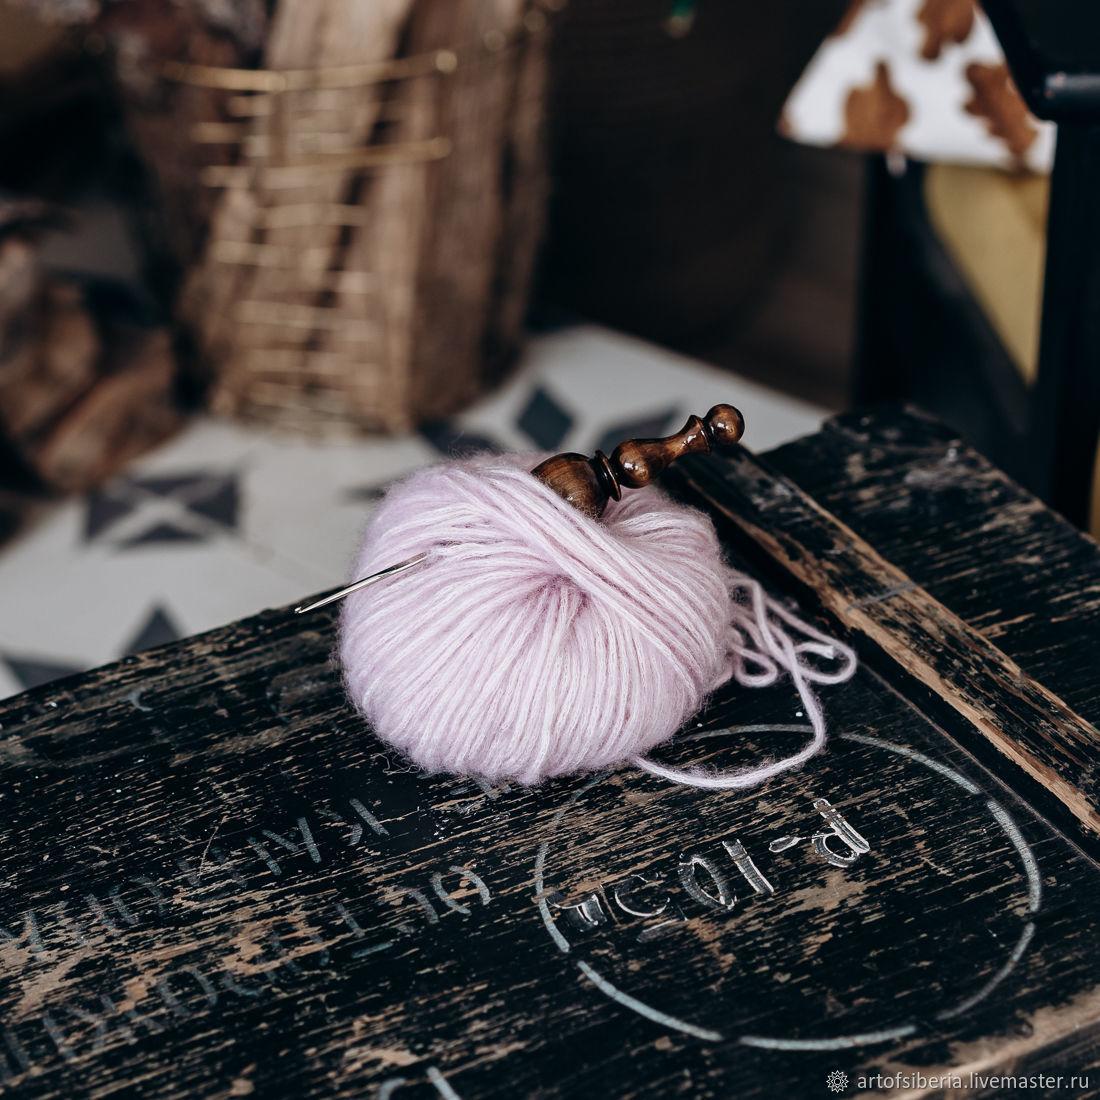 1,3 mm iron crochet hook with wooden handle (cedar) K219, Crochet Hooks, Novokuznetsk,  Фото №1